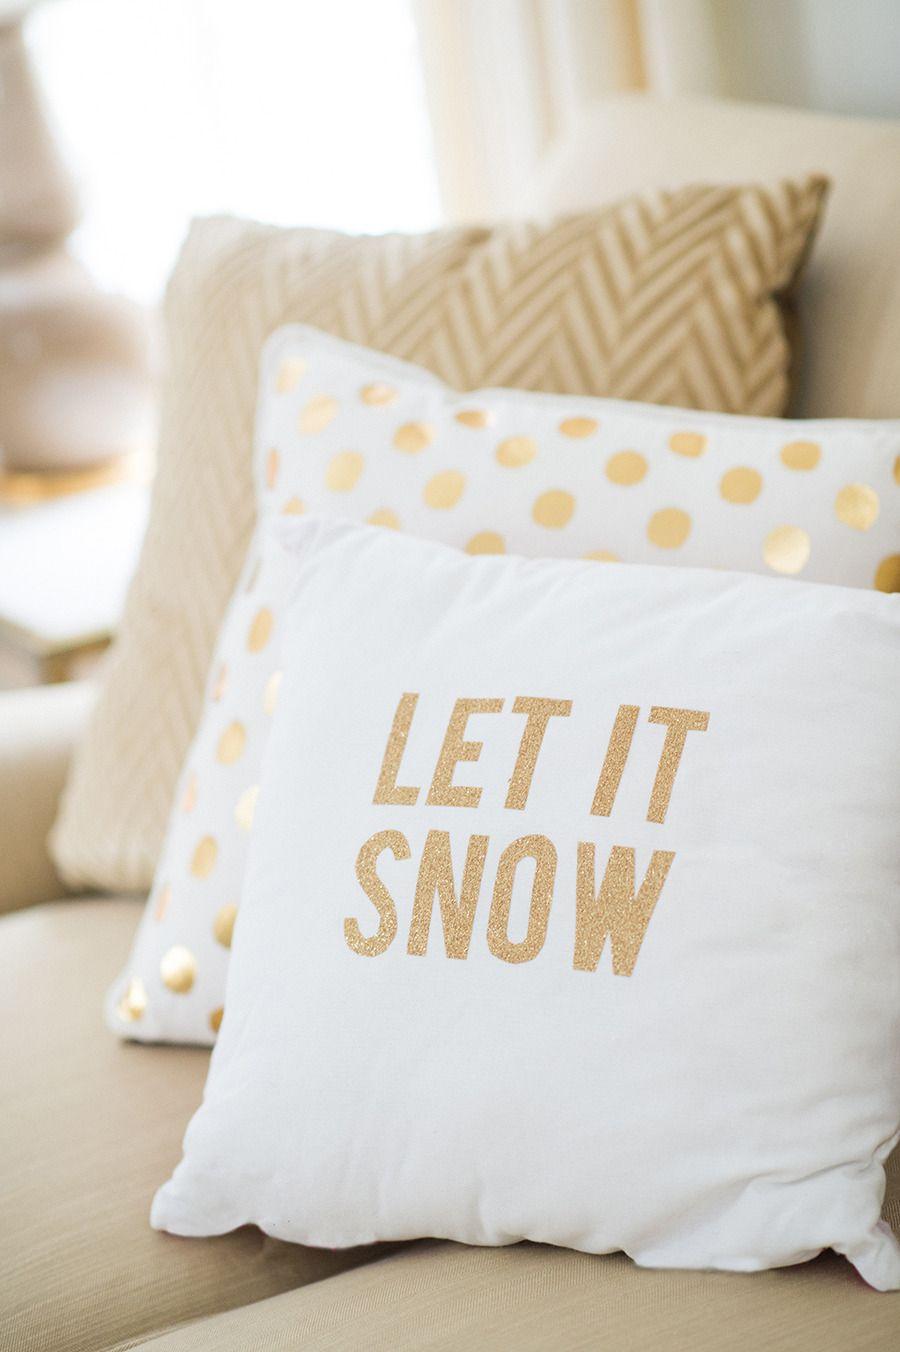 Diy Holiday Throw Pillows Diy Holiday Throw Pillows Holiday Throw Pillow Christmas Cushions